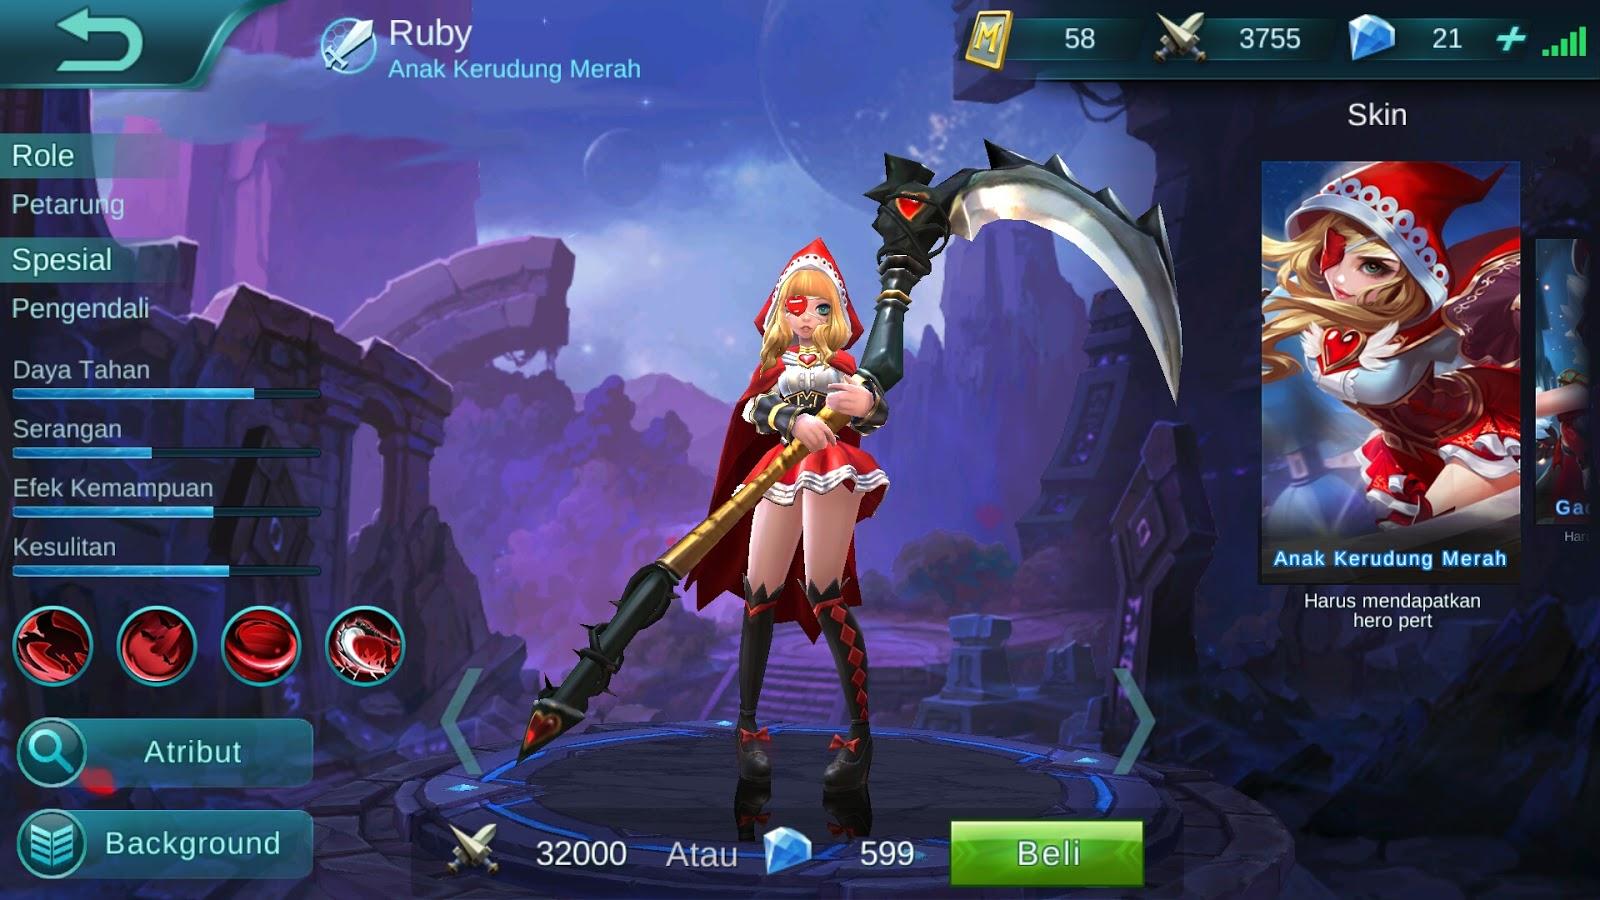 Hero Ruby Anak Kerudung Merah Dagerous Attack Build Set Up Gear DolskyCorp